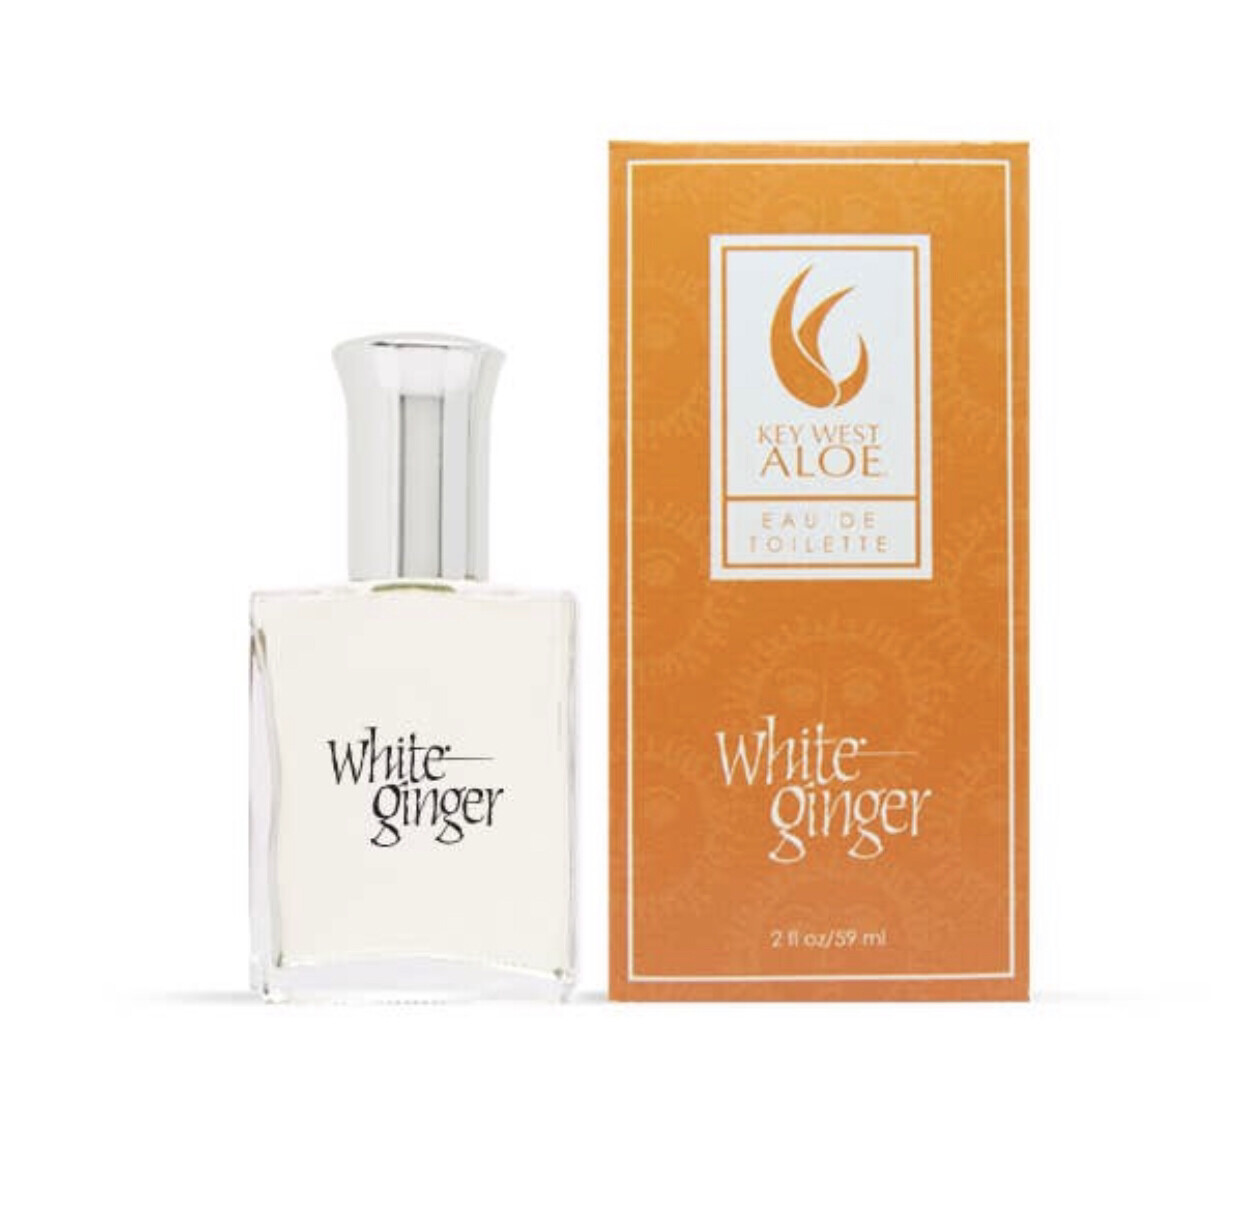 2oz White Ginger Perfume